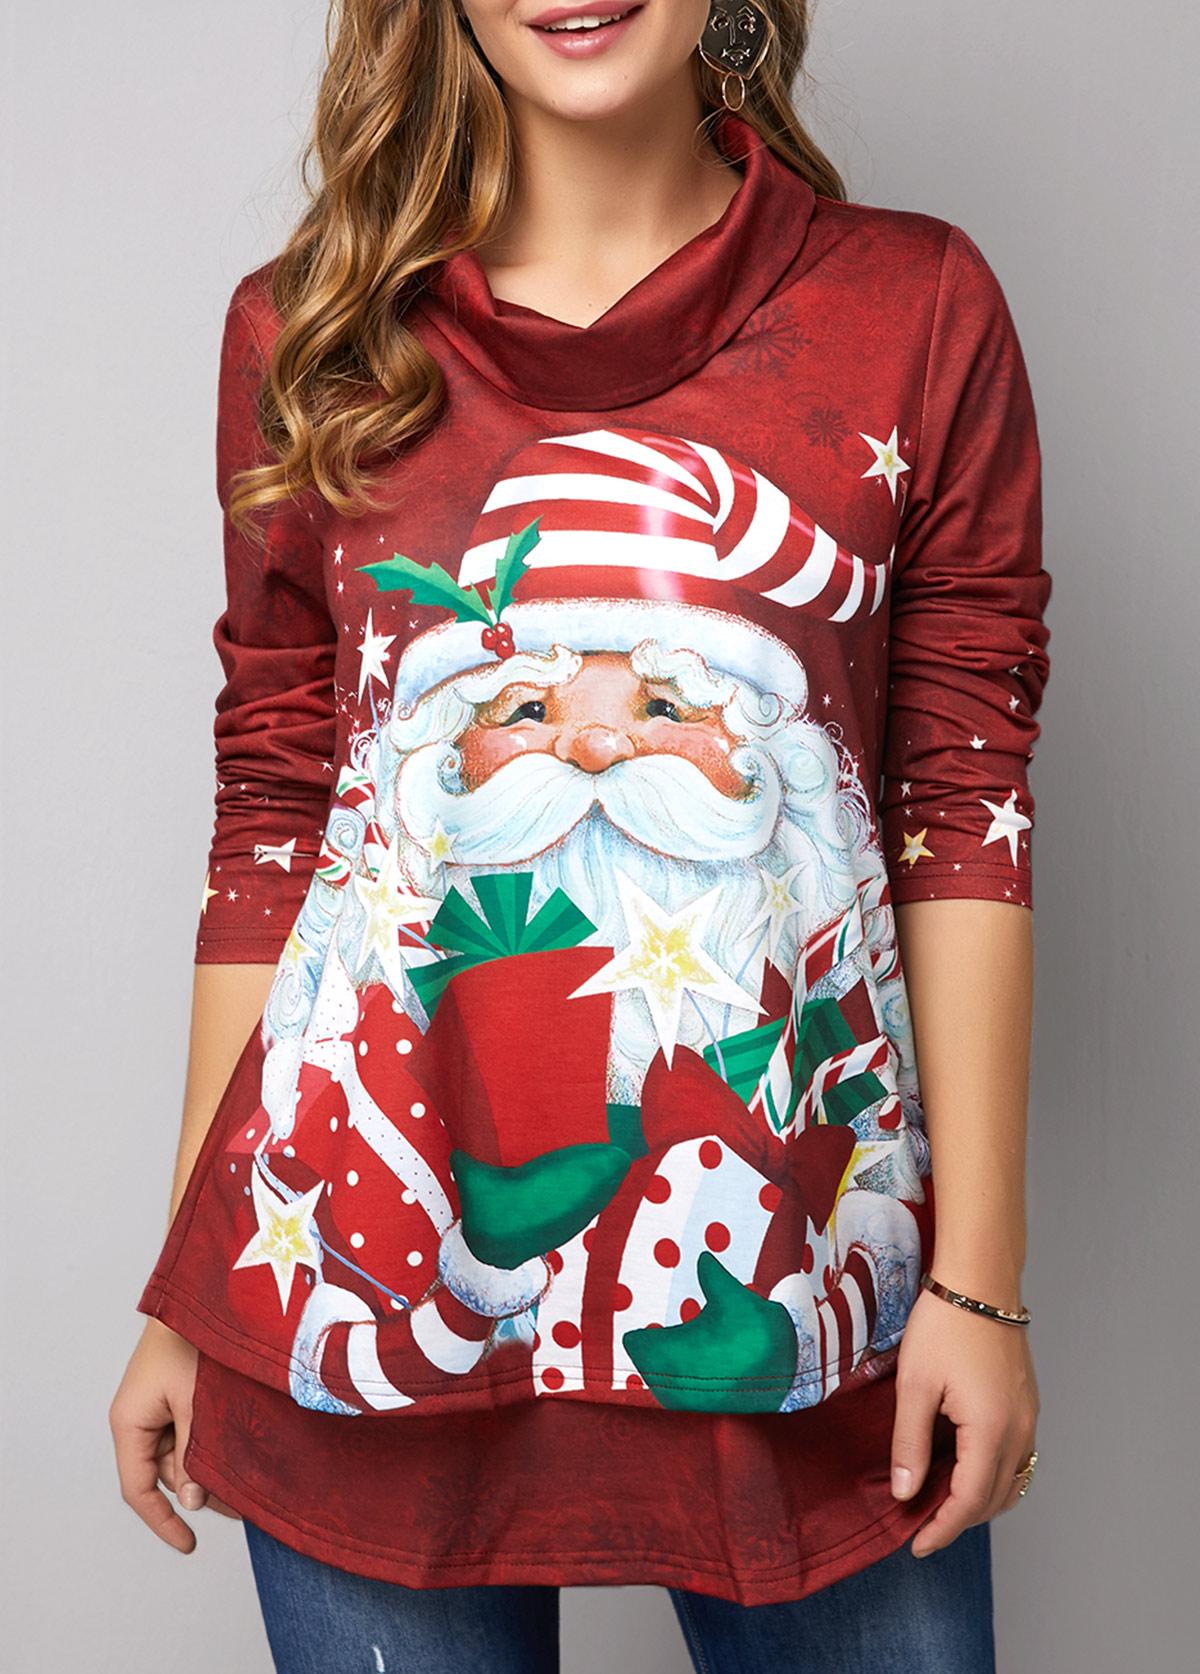 Christmas Print Long Sleeve Red Sweatshirt